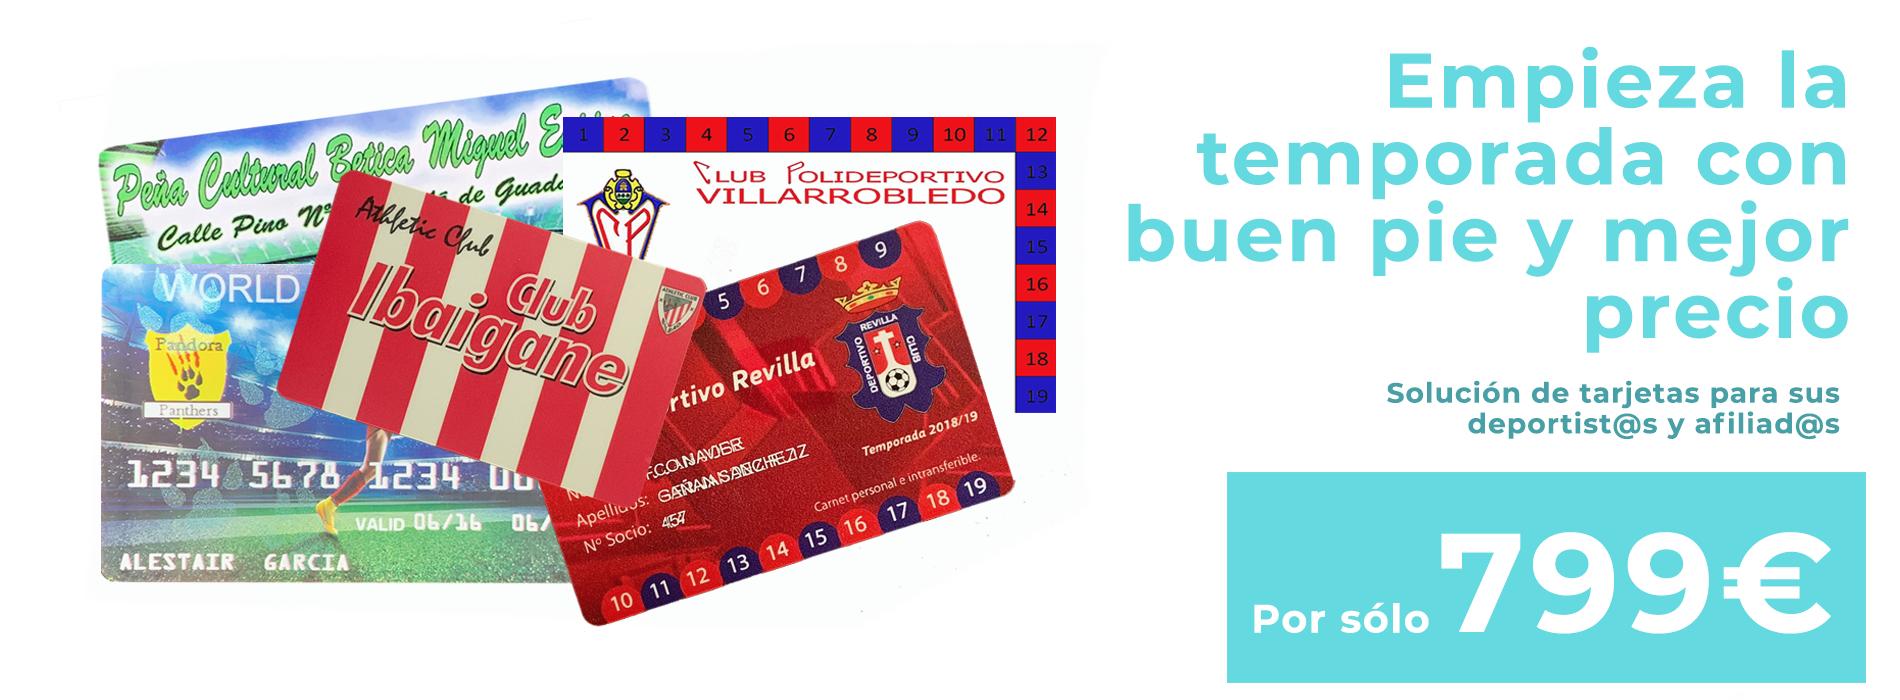 slider futbol 1 - Sipcards: La mejor oferta de Impresoras y tarjetas PVC